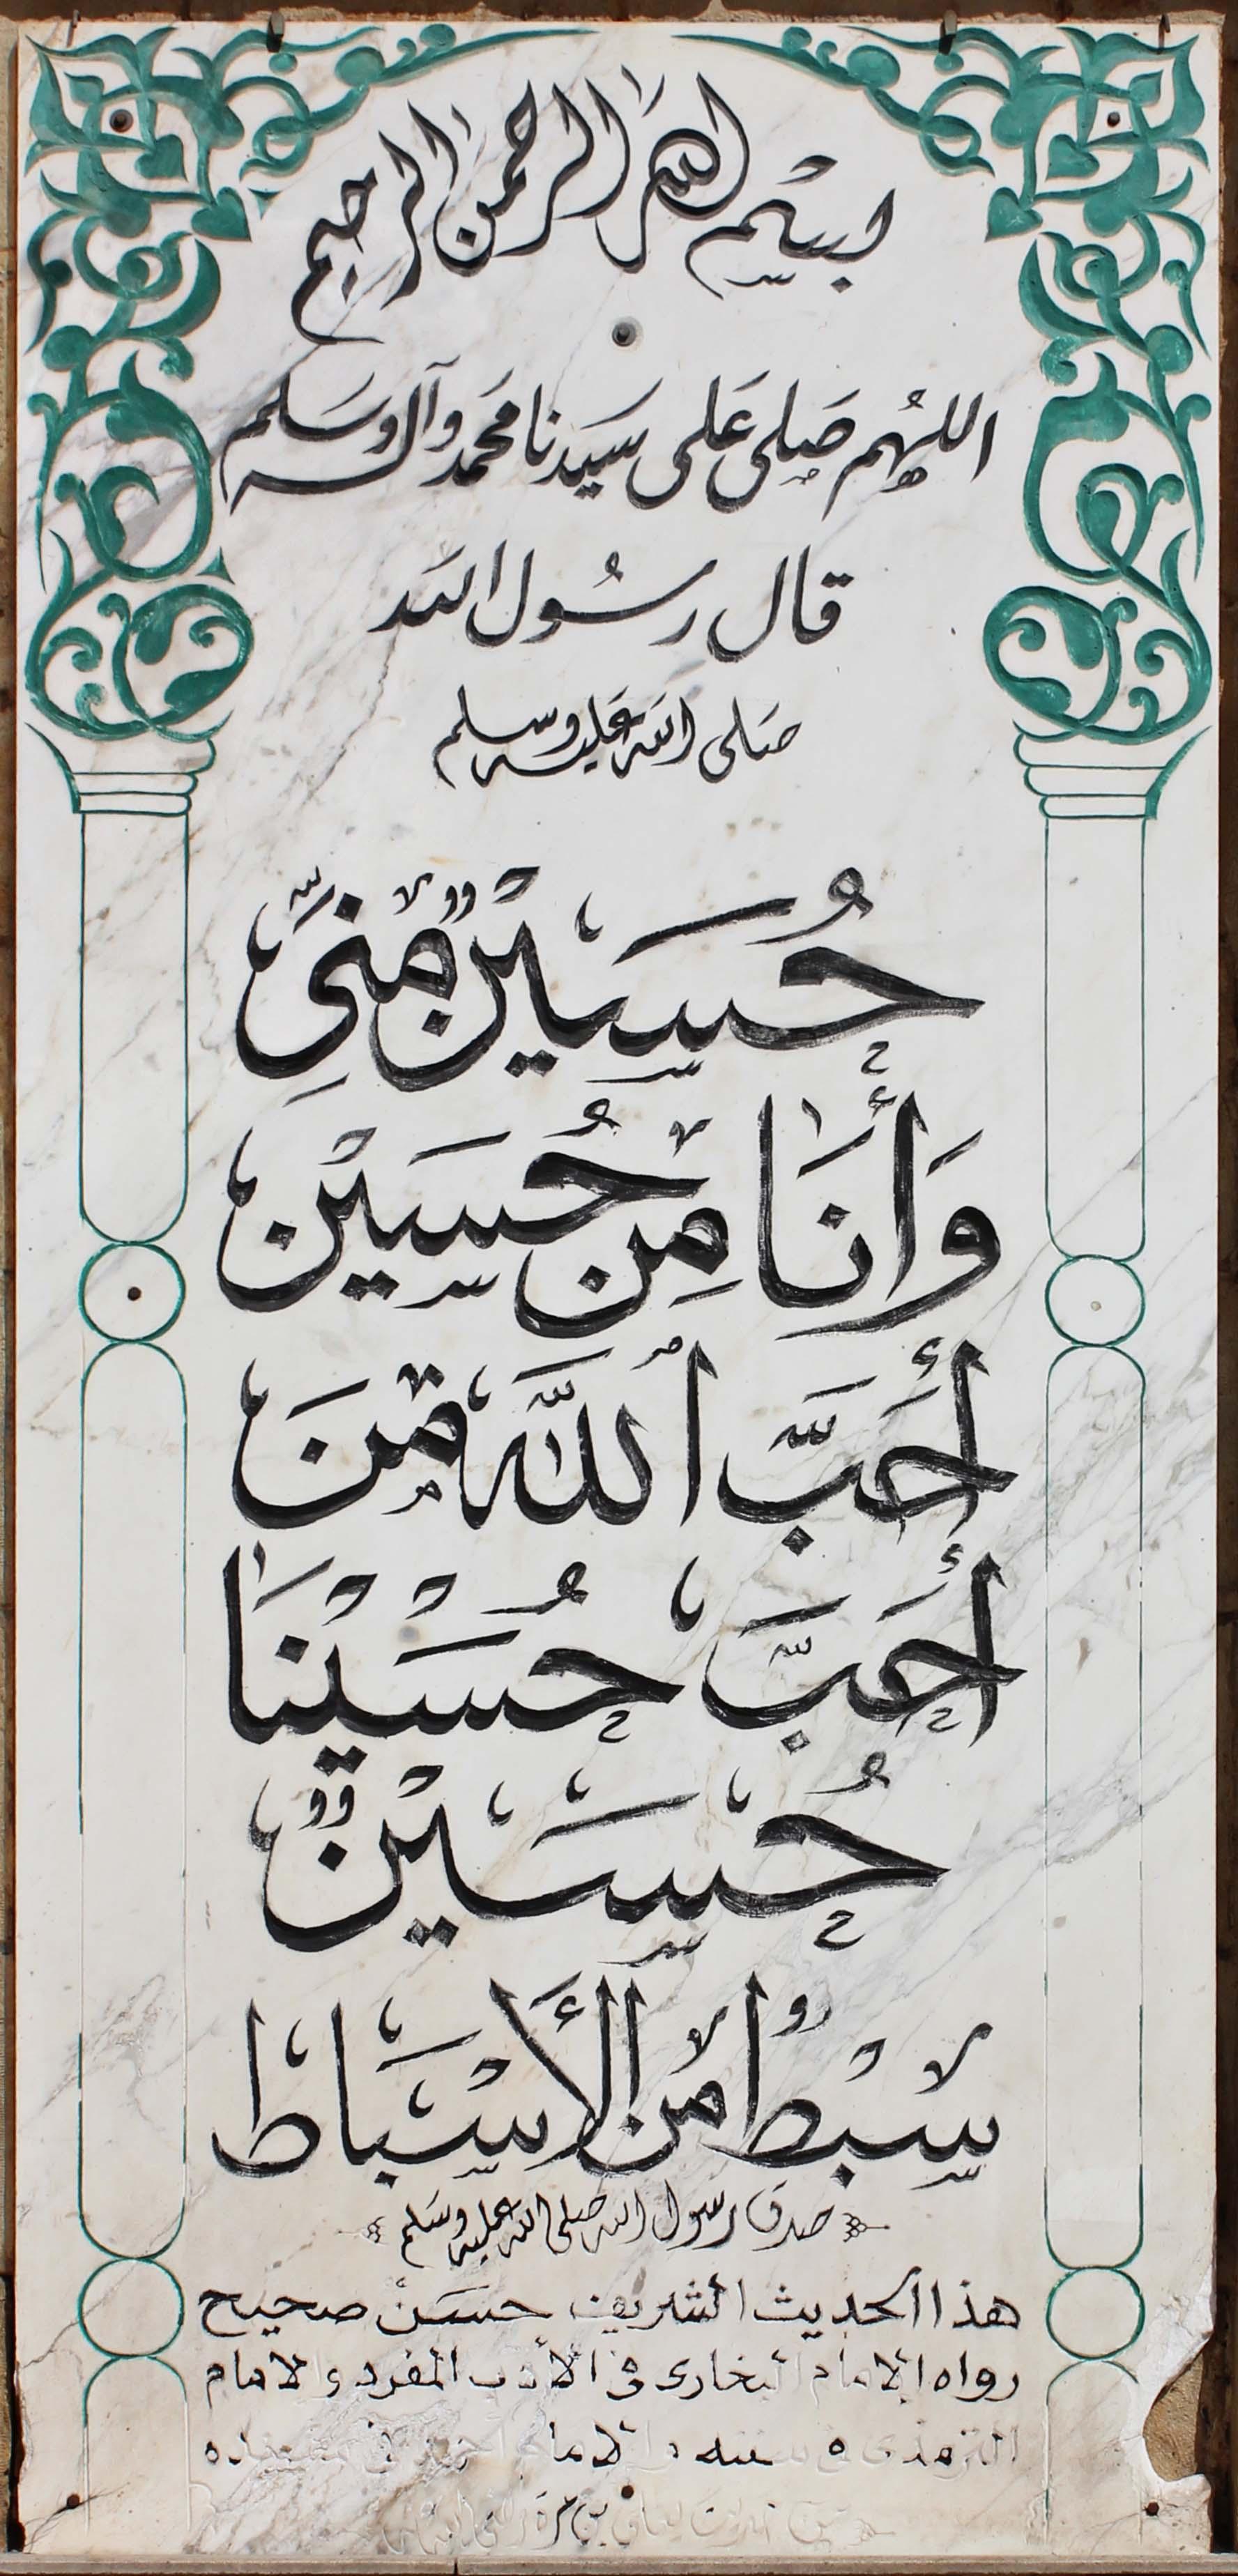 [عکس: Imam-Hussein-Hadith-inscription-00-4-B-.jpg]